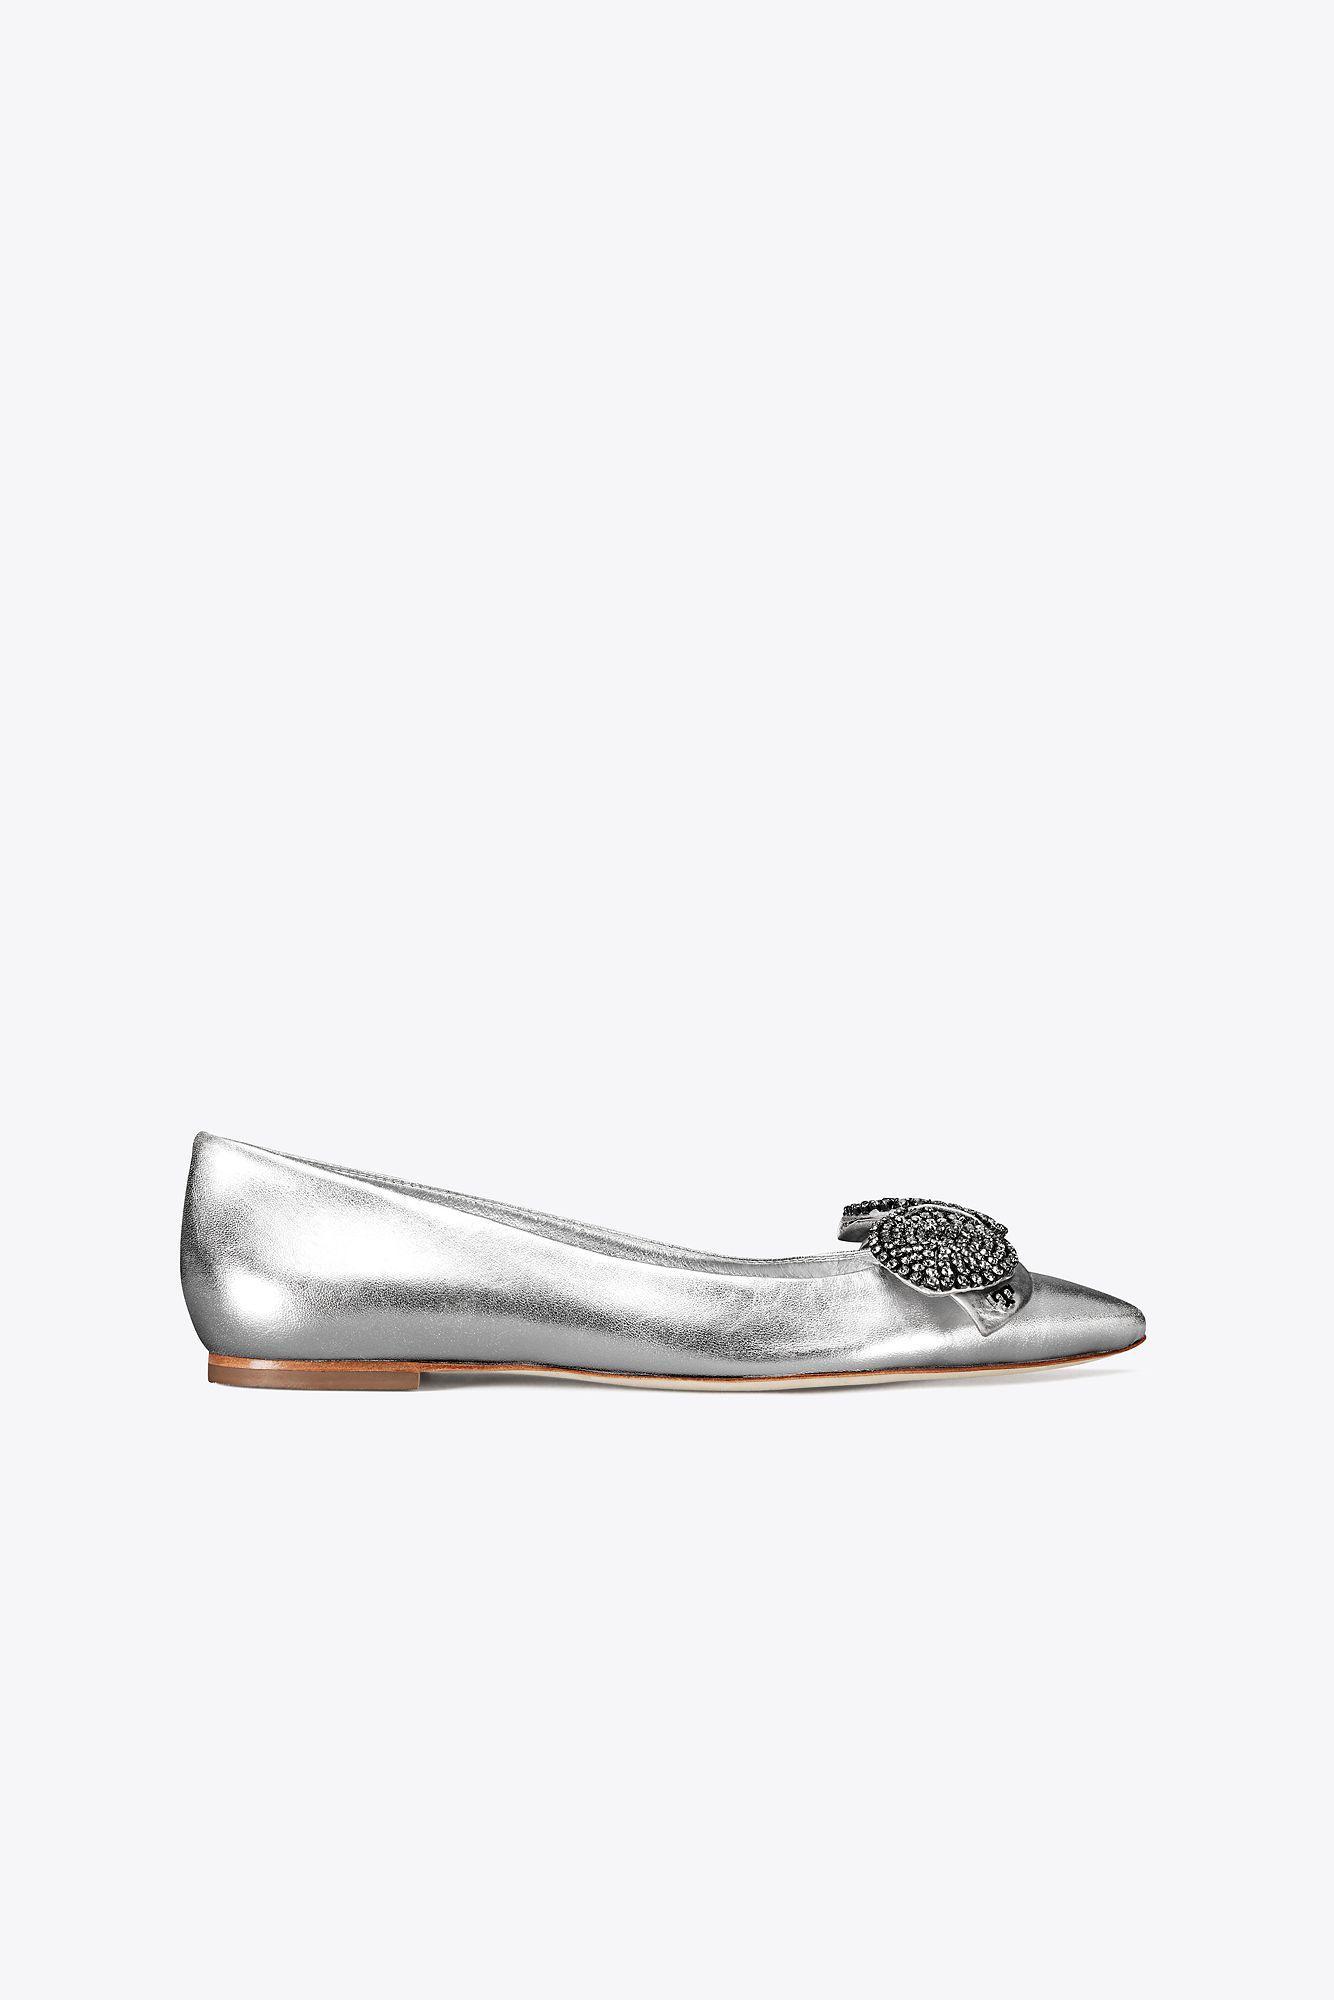 723cfe9b0735 Lyst - Tory Burch Rosalind Embellished Ballet Flat